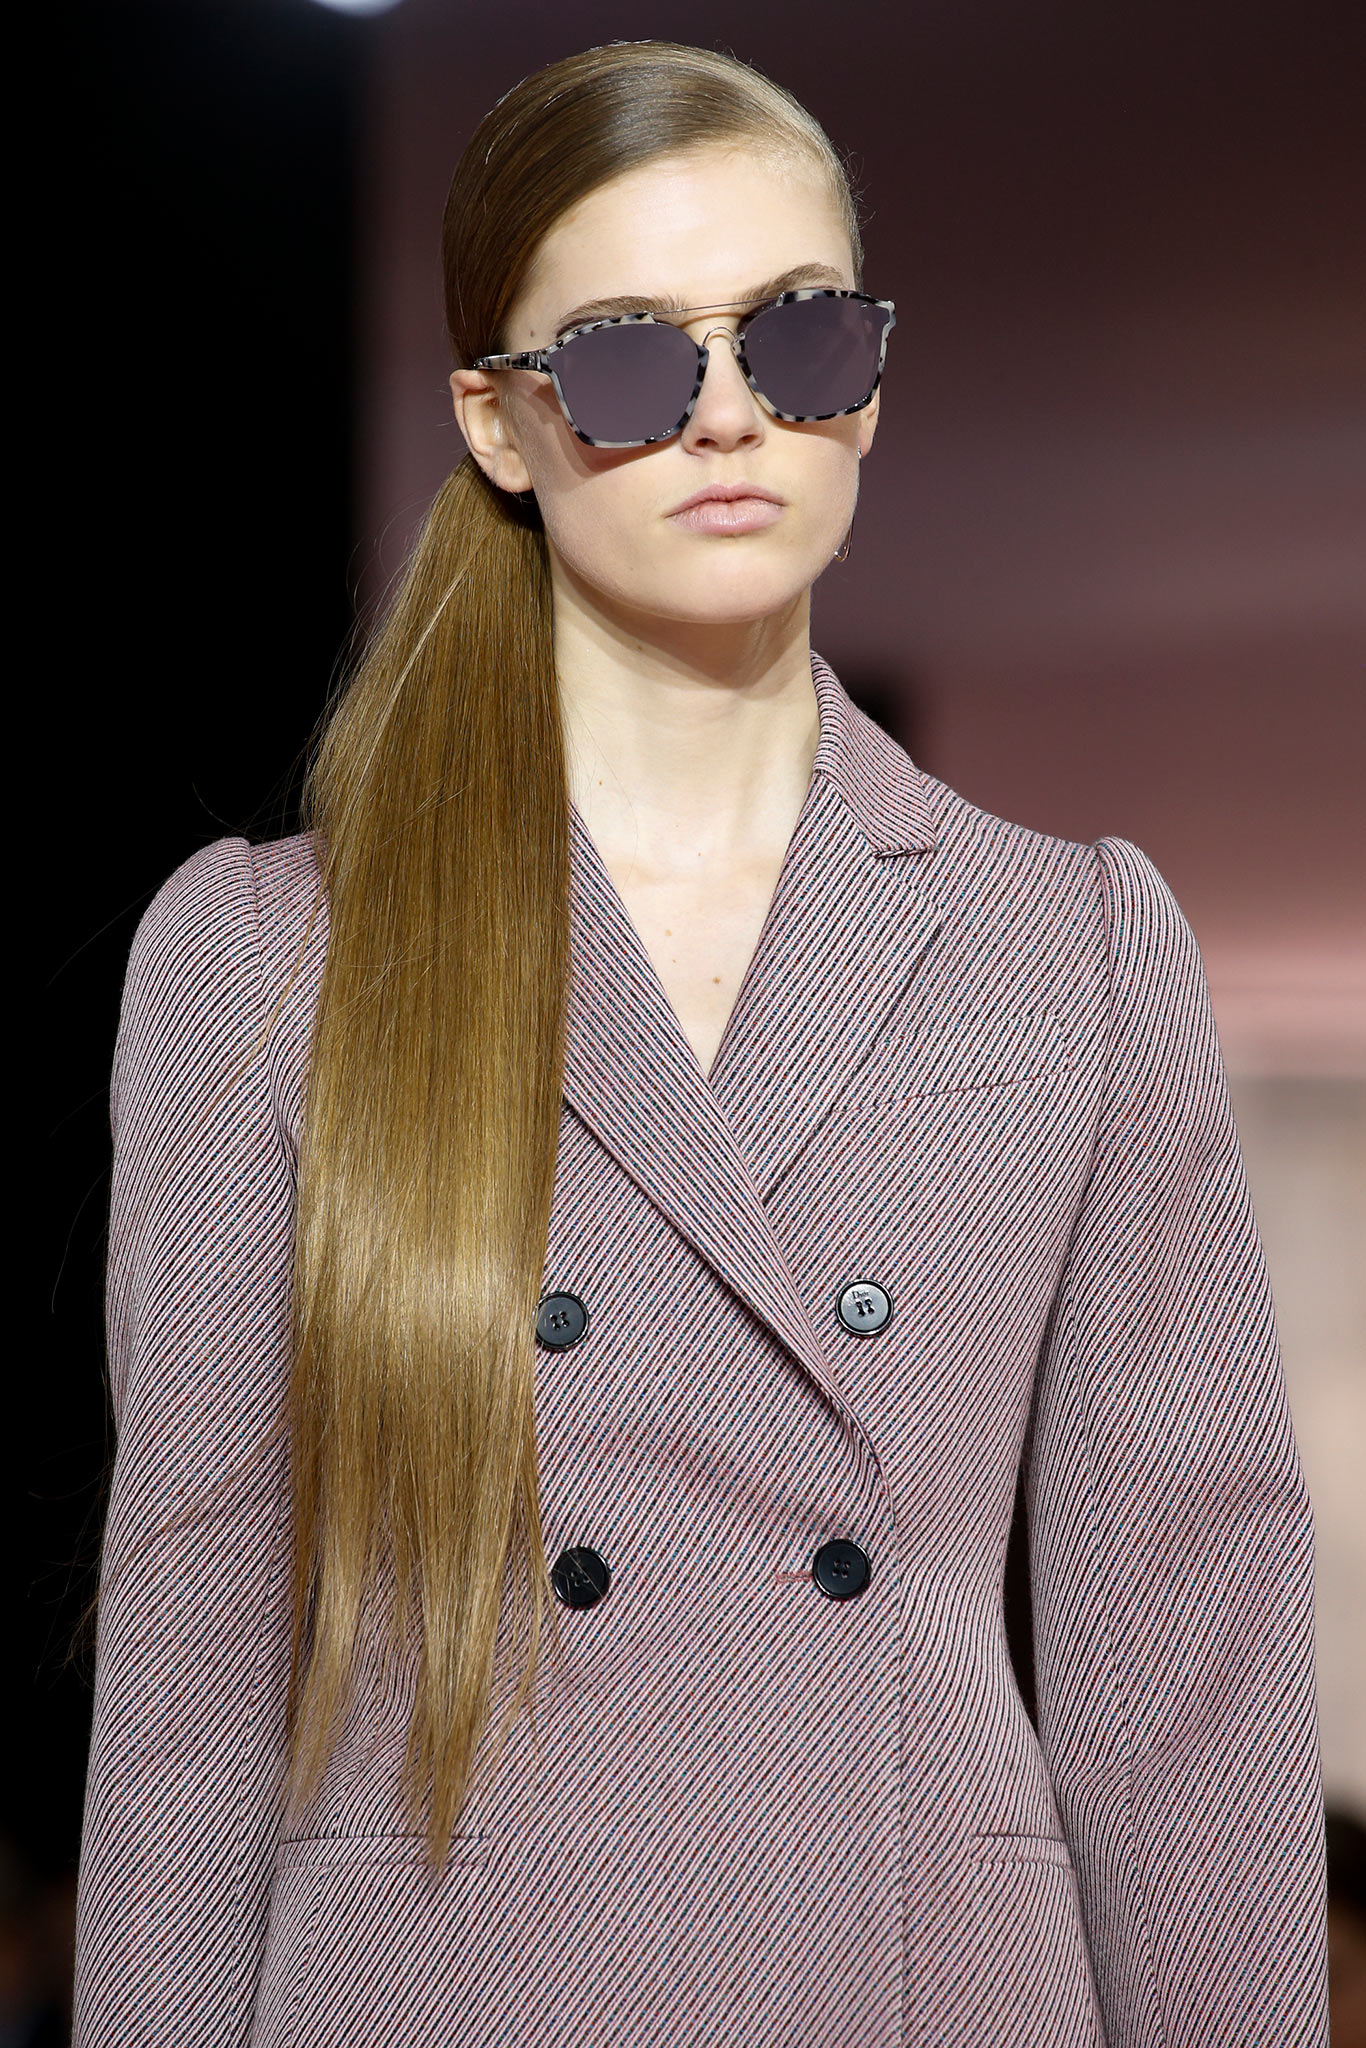 Christian Dior - Inverno 2015-2016 imagem: style